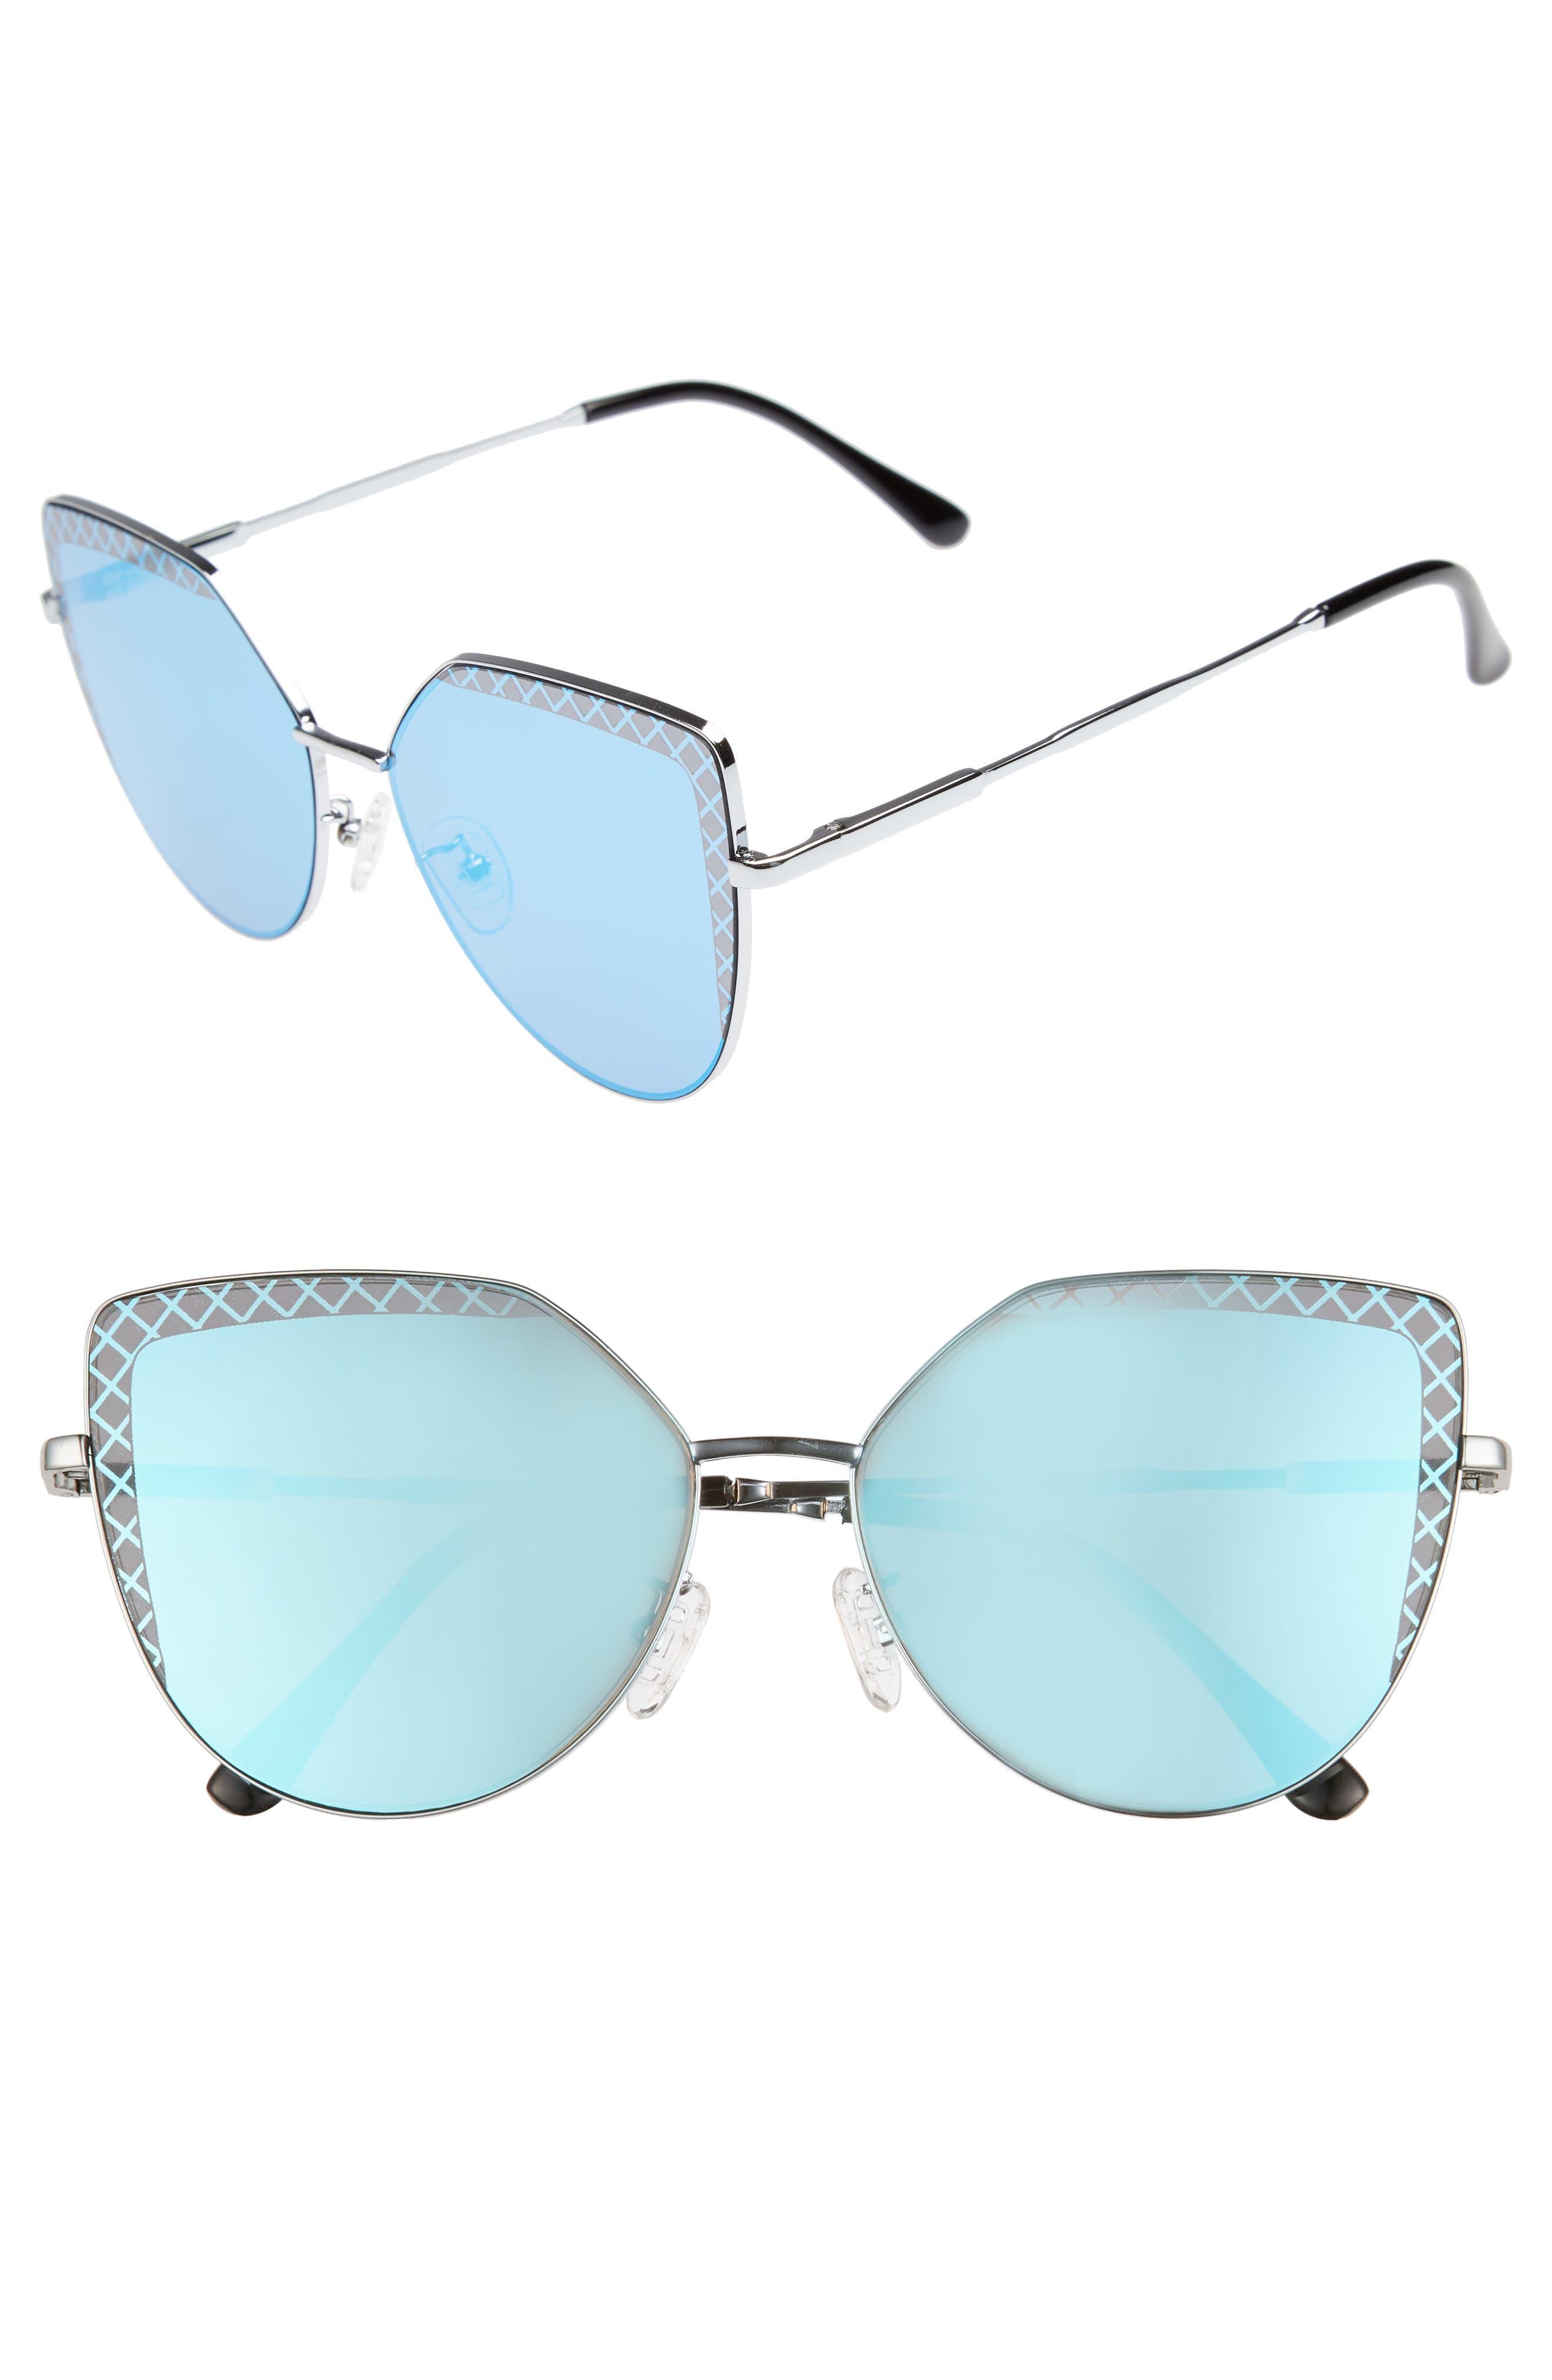 60mm Textured Lens Cat Eye Sunglasses,                             Main thumbnail 1, color,                             Silver/ Blue